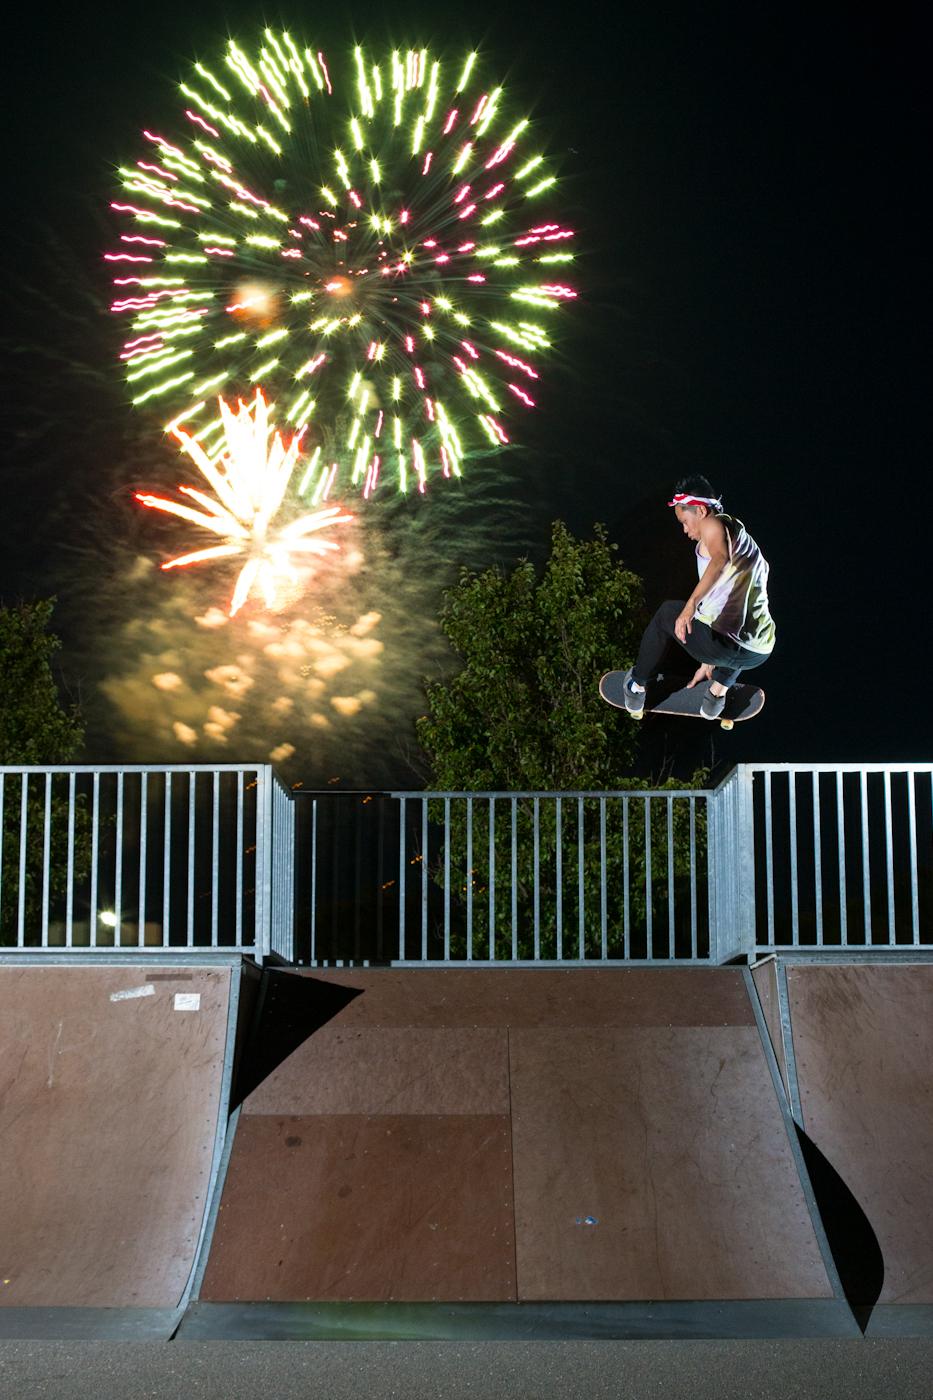 Palermo_mike fireworks grab skatefolio.jpg